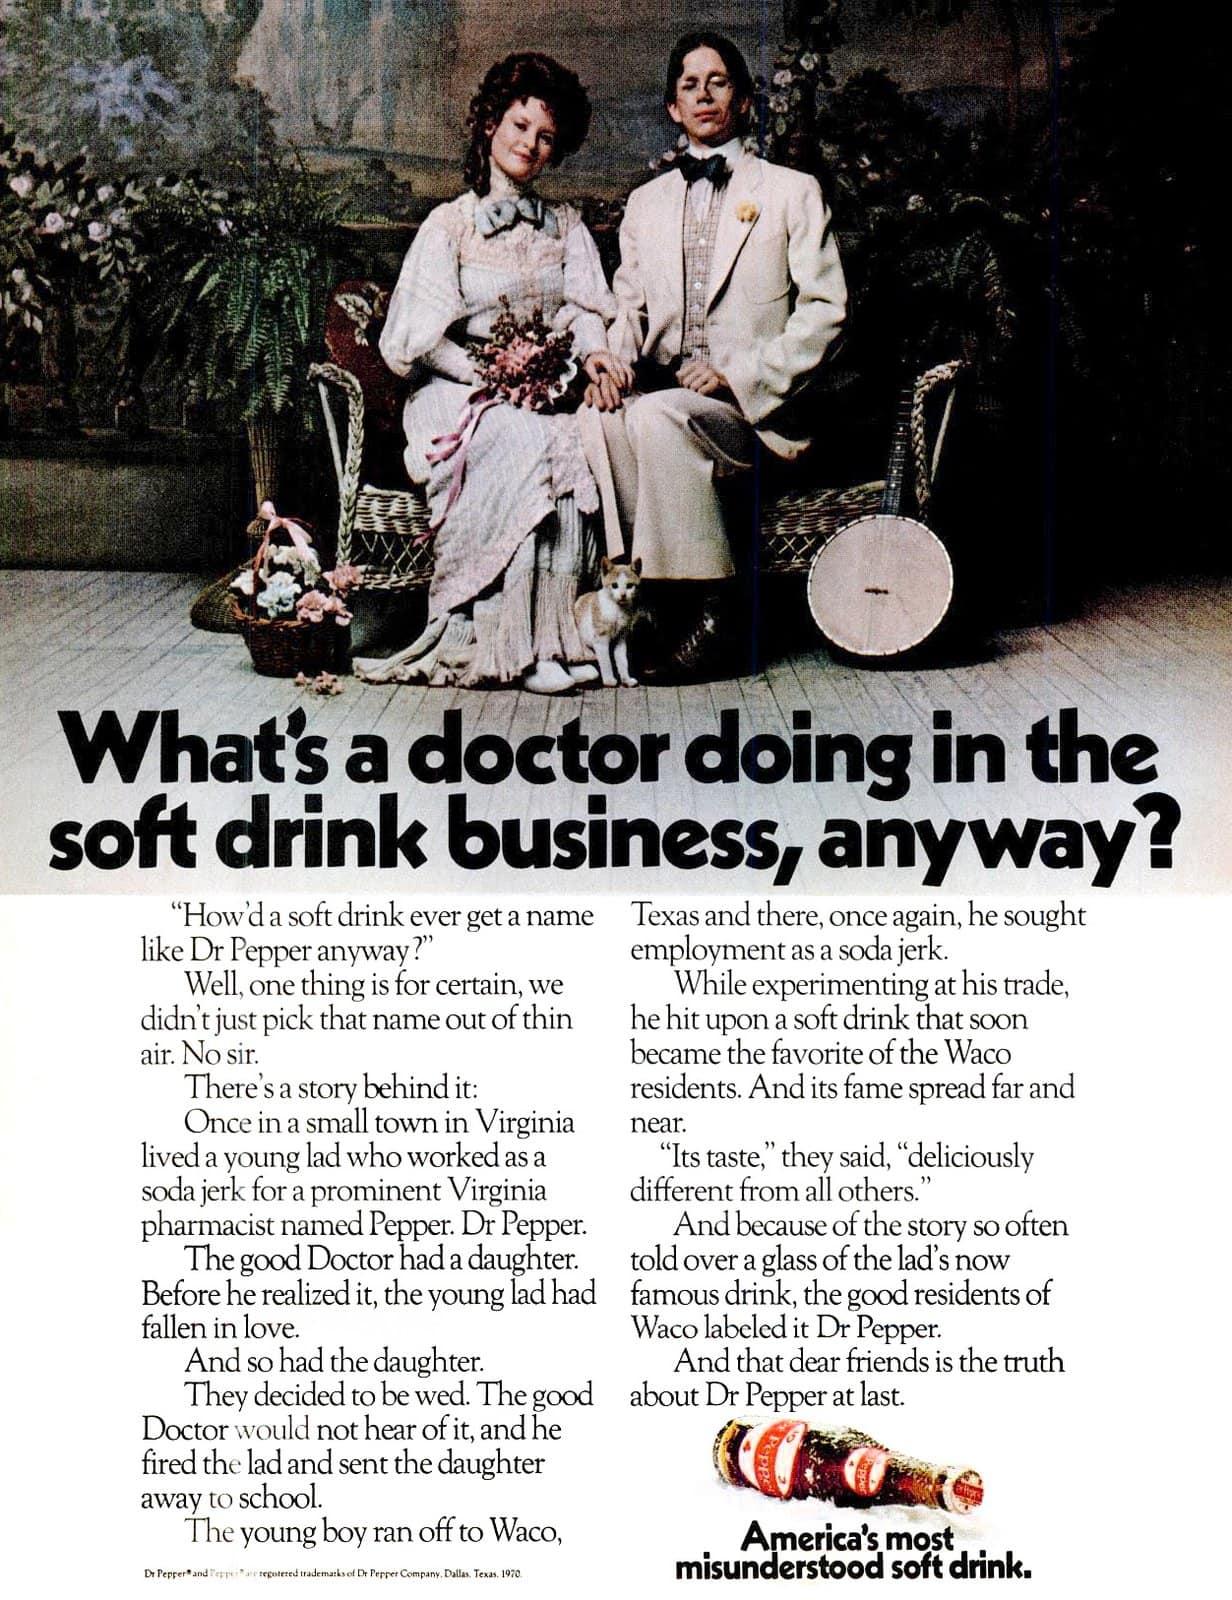 Dr Pepper soft drink business (1970)